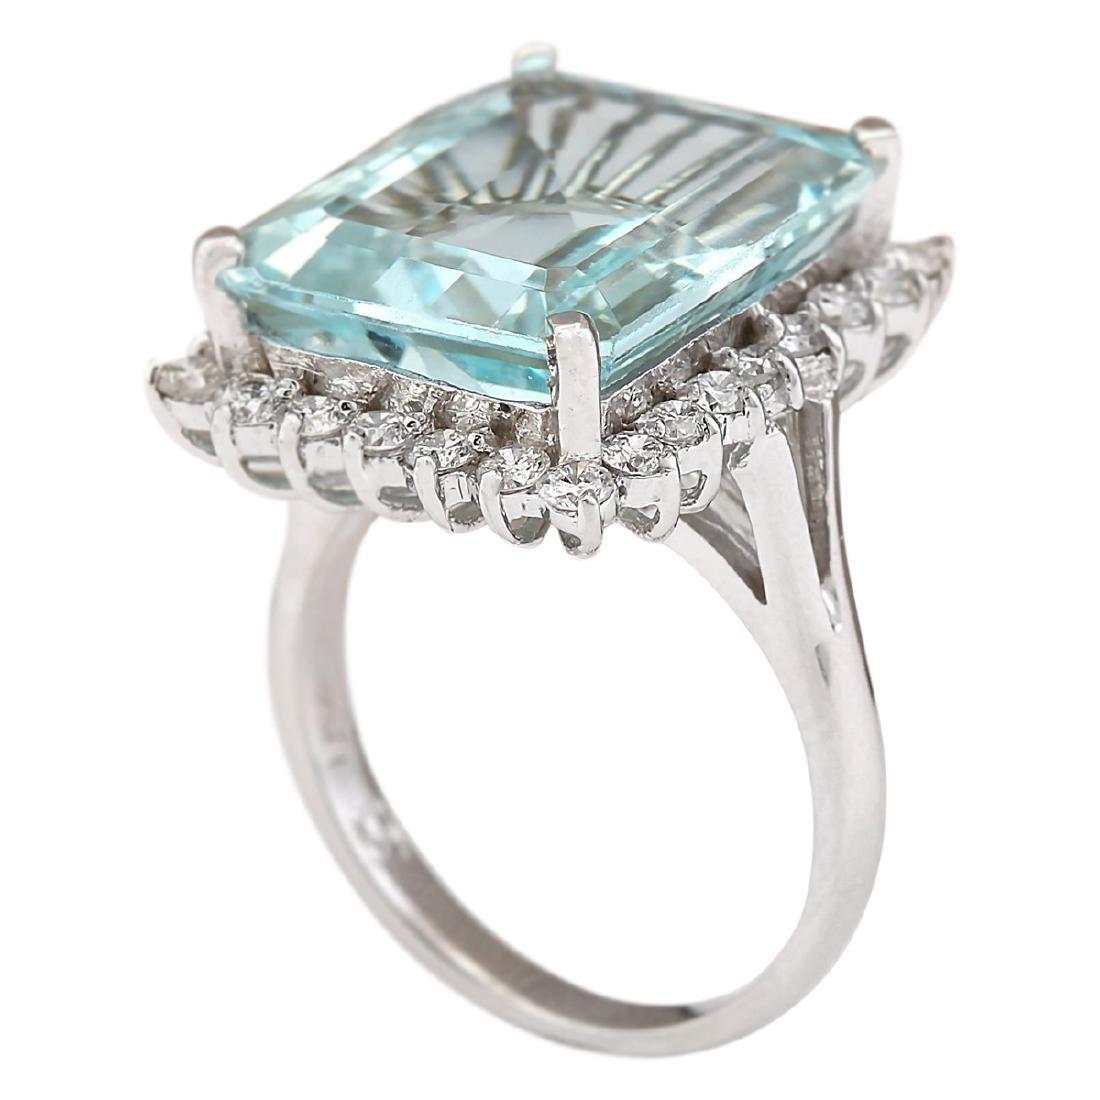 12.29 CTW Natural Aquamarine And Diamond Ring In 18K - 3